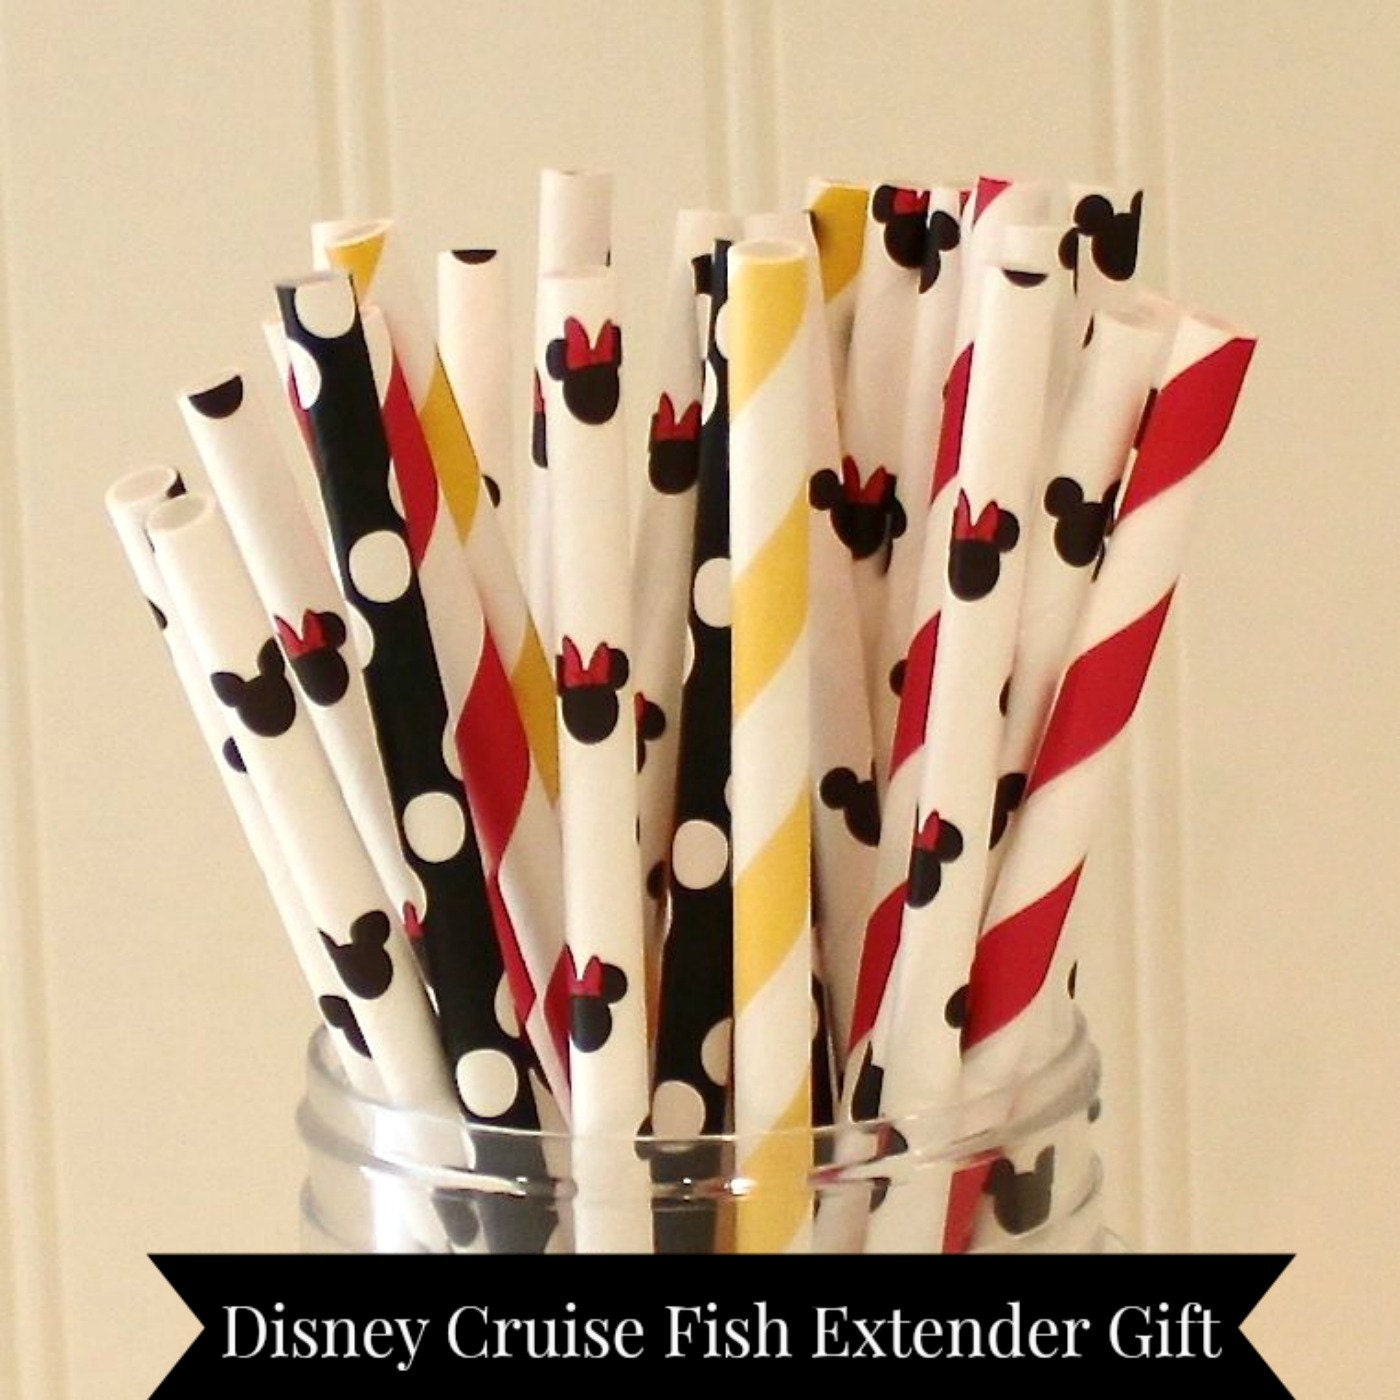 Disney cruise fish extender gift 100 paper straws mickey for Disney cruise fish extender